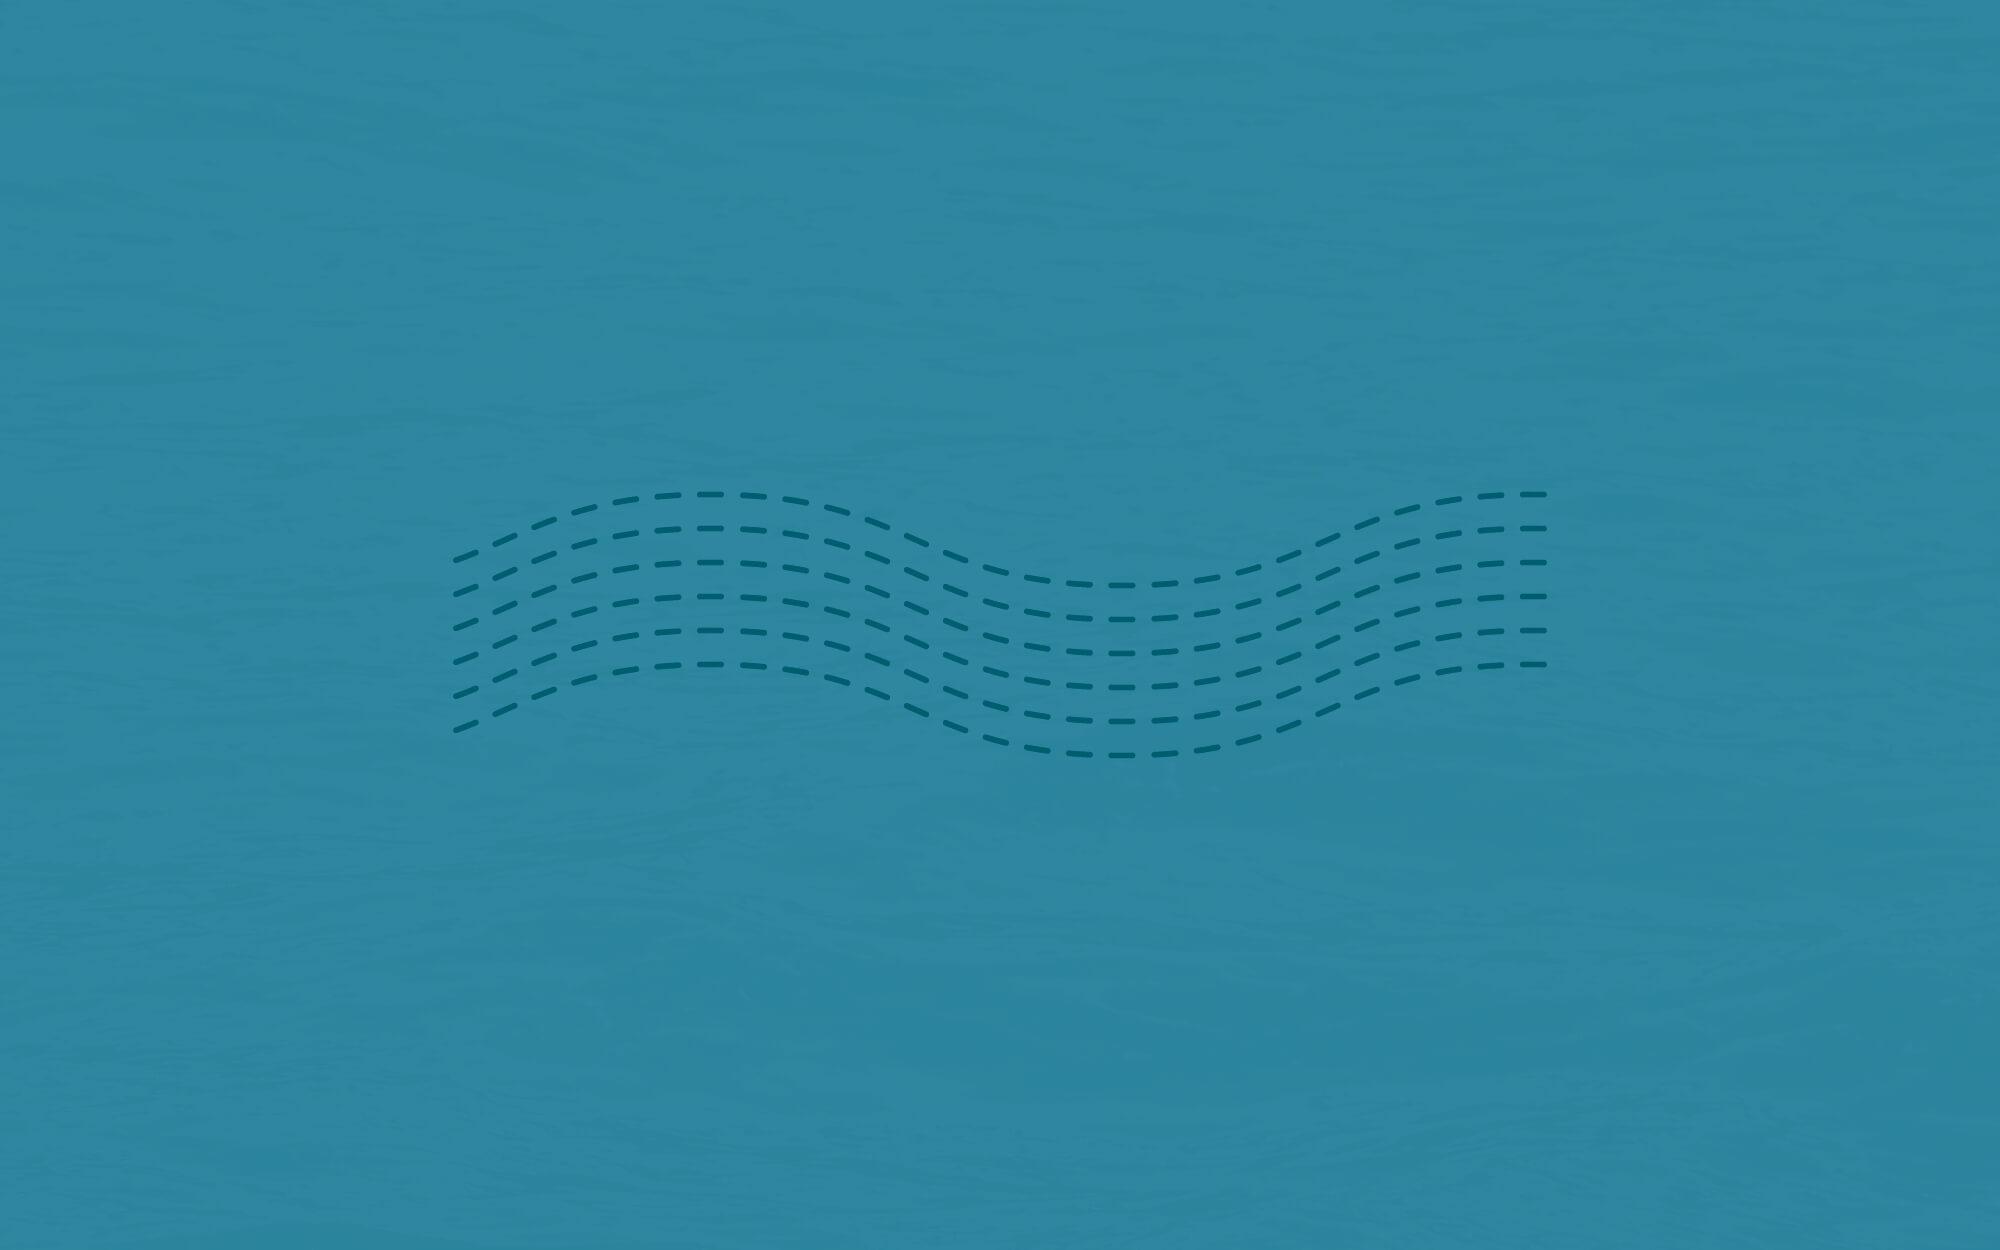 River of Birds wave image